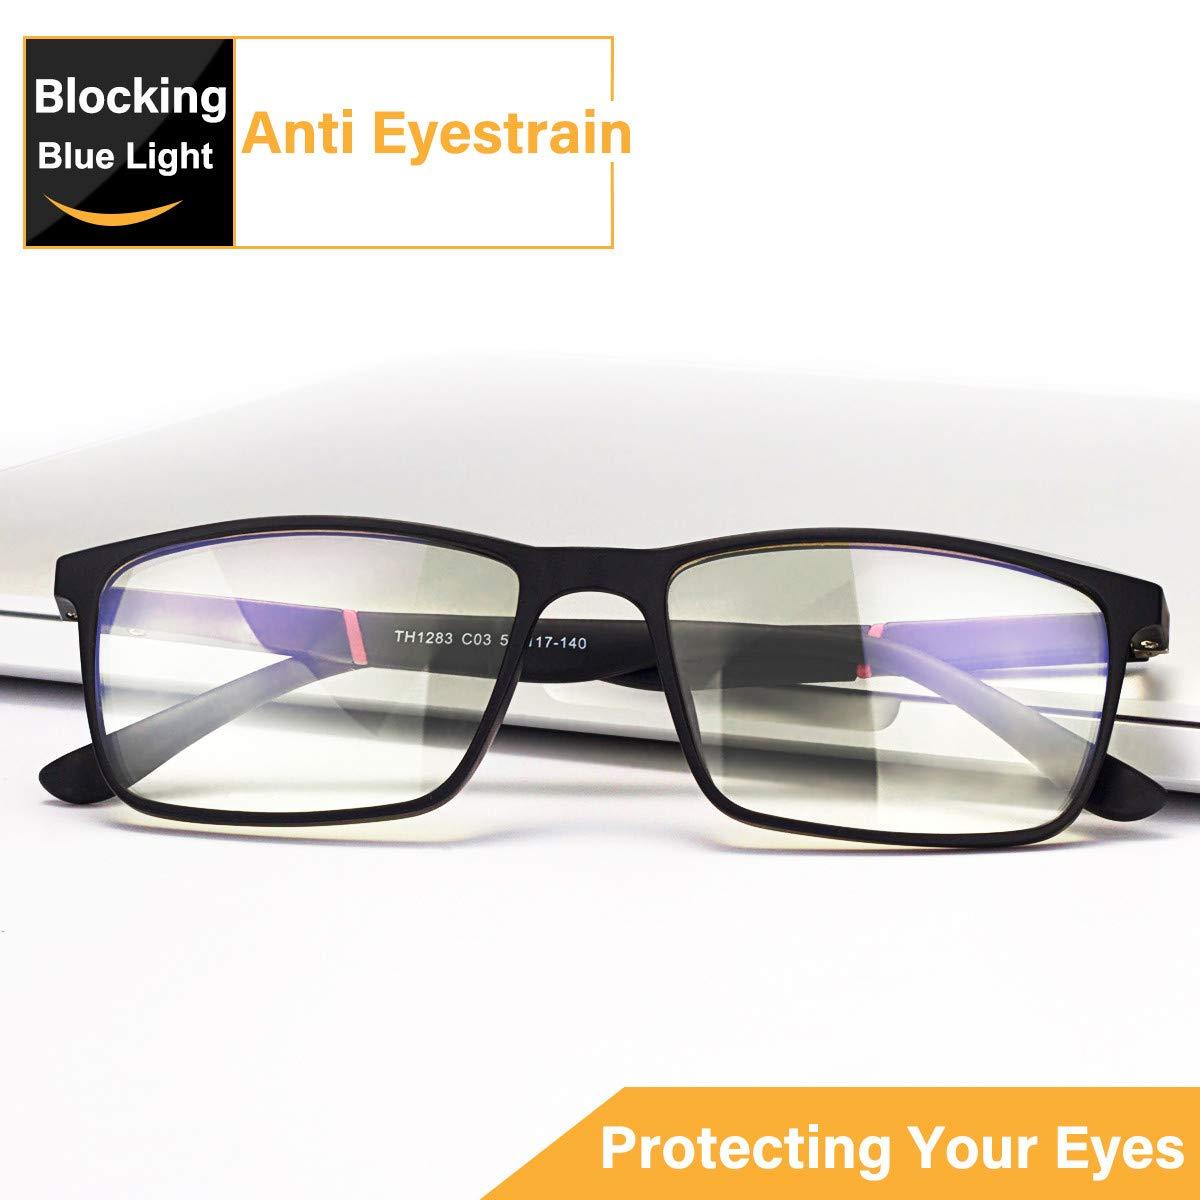 Blue Light Blocking Glasses,Computer Glasses,JACNITAD Anti Glare, Relieve Eyes Fatigue, Blocking Headaches, Premium Gamer & Computer & Reading Eye-wear, Anti Blue Light Lenses for Men & Women